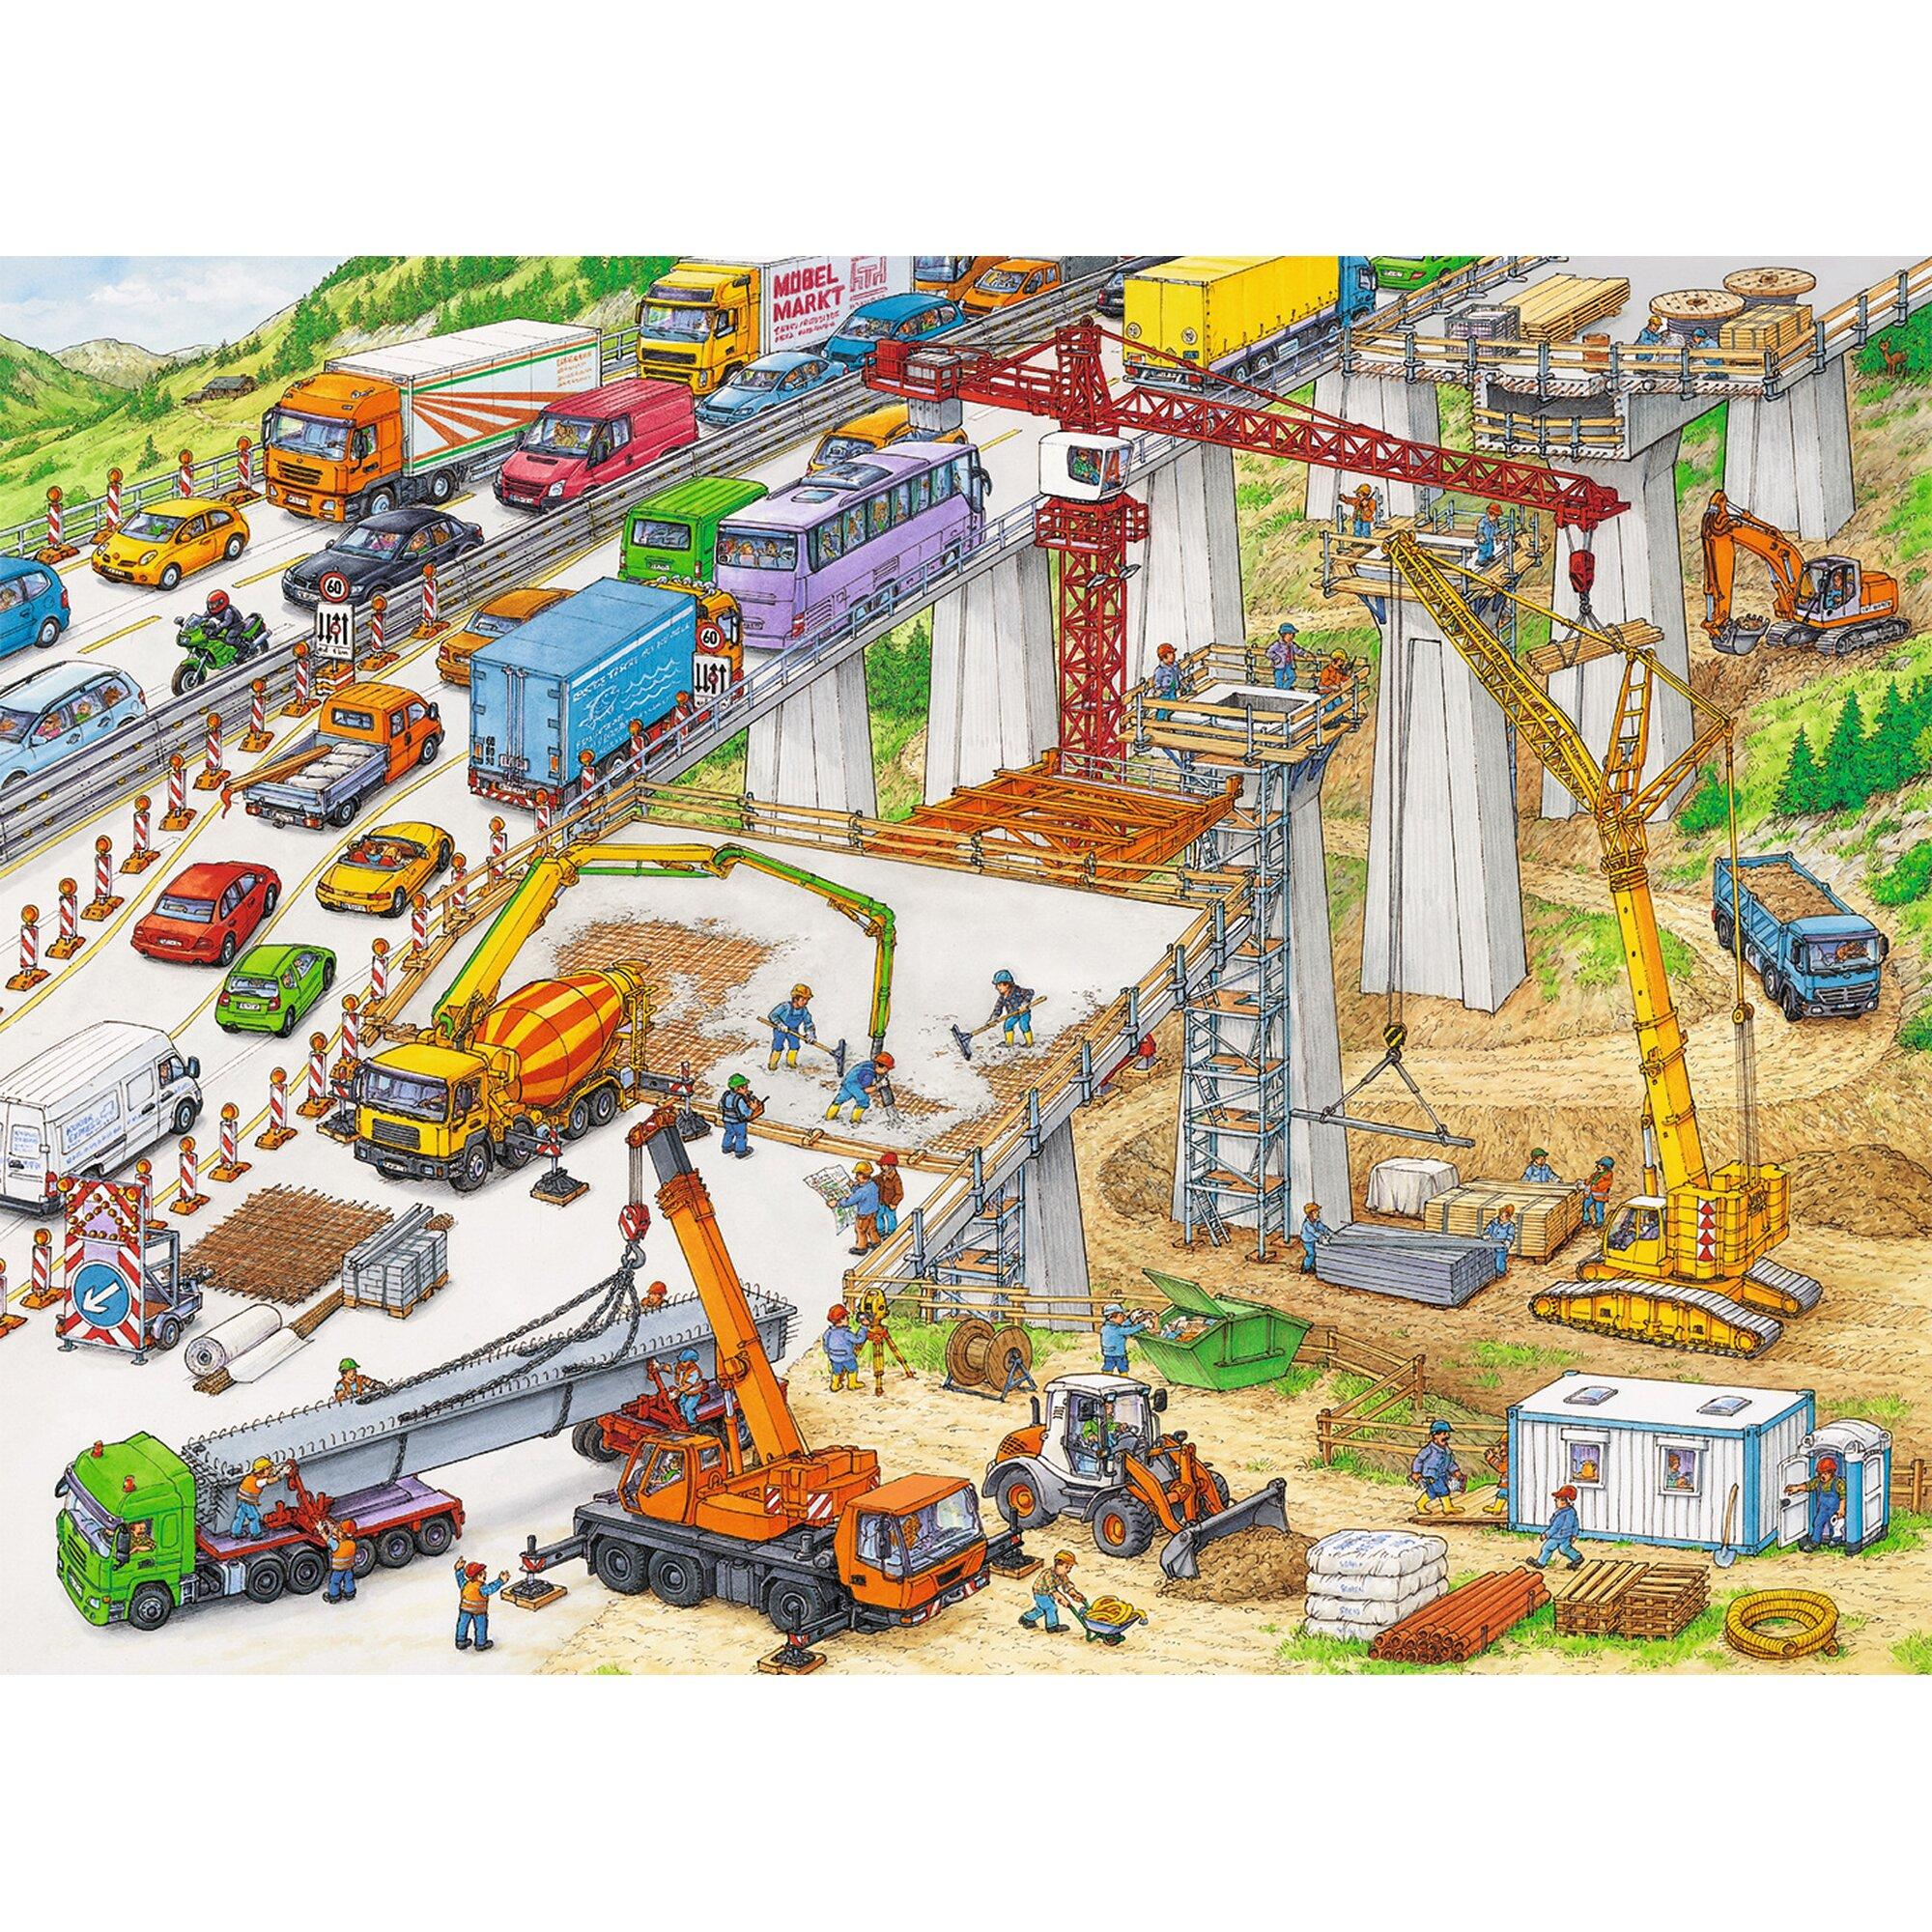 ravensburger-kinderpuzzle-im-xxl-format-100-teile-riesige-baustelle